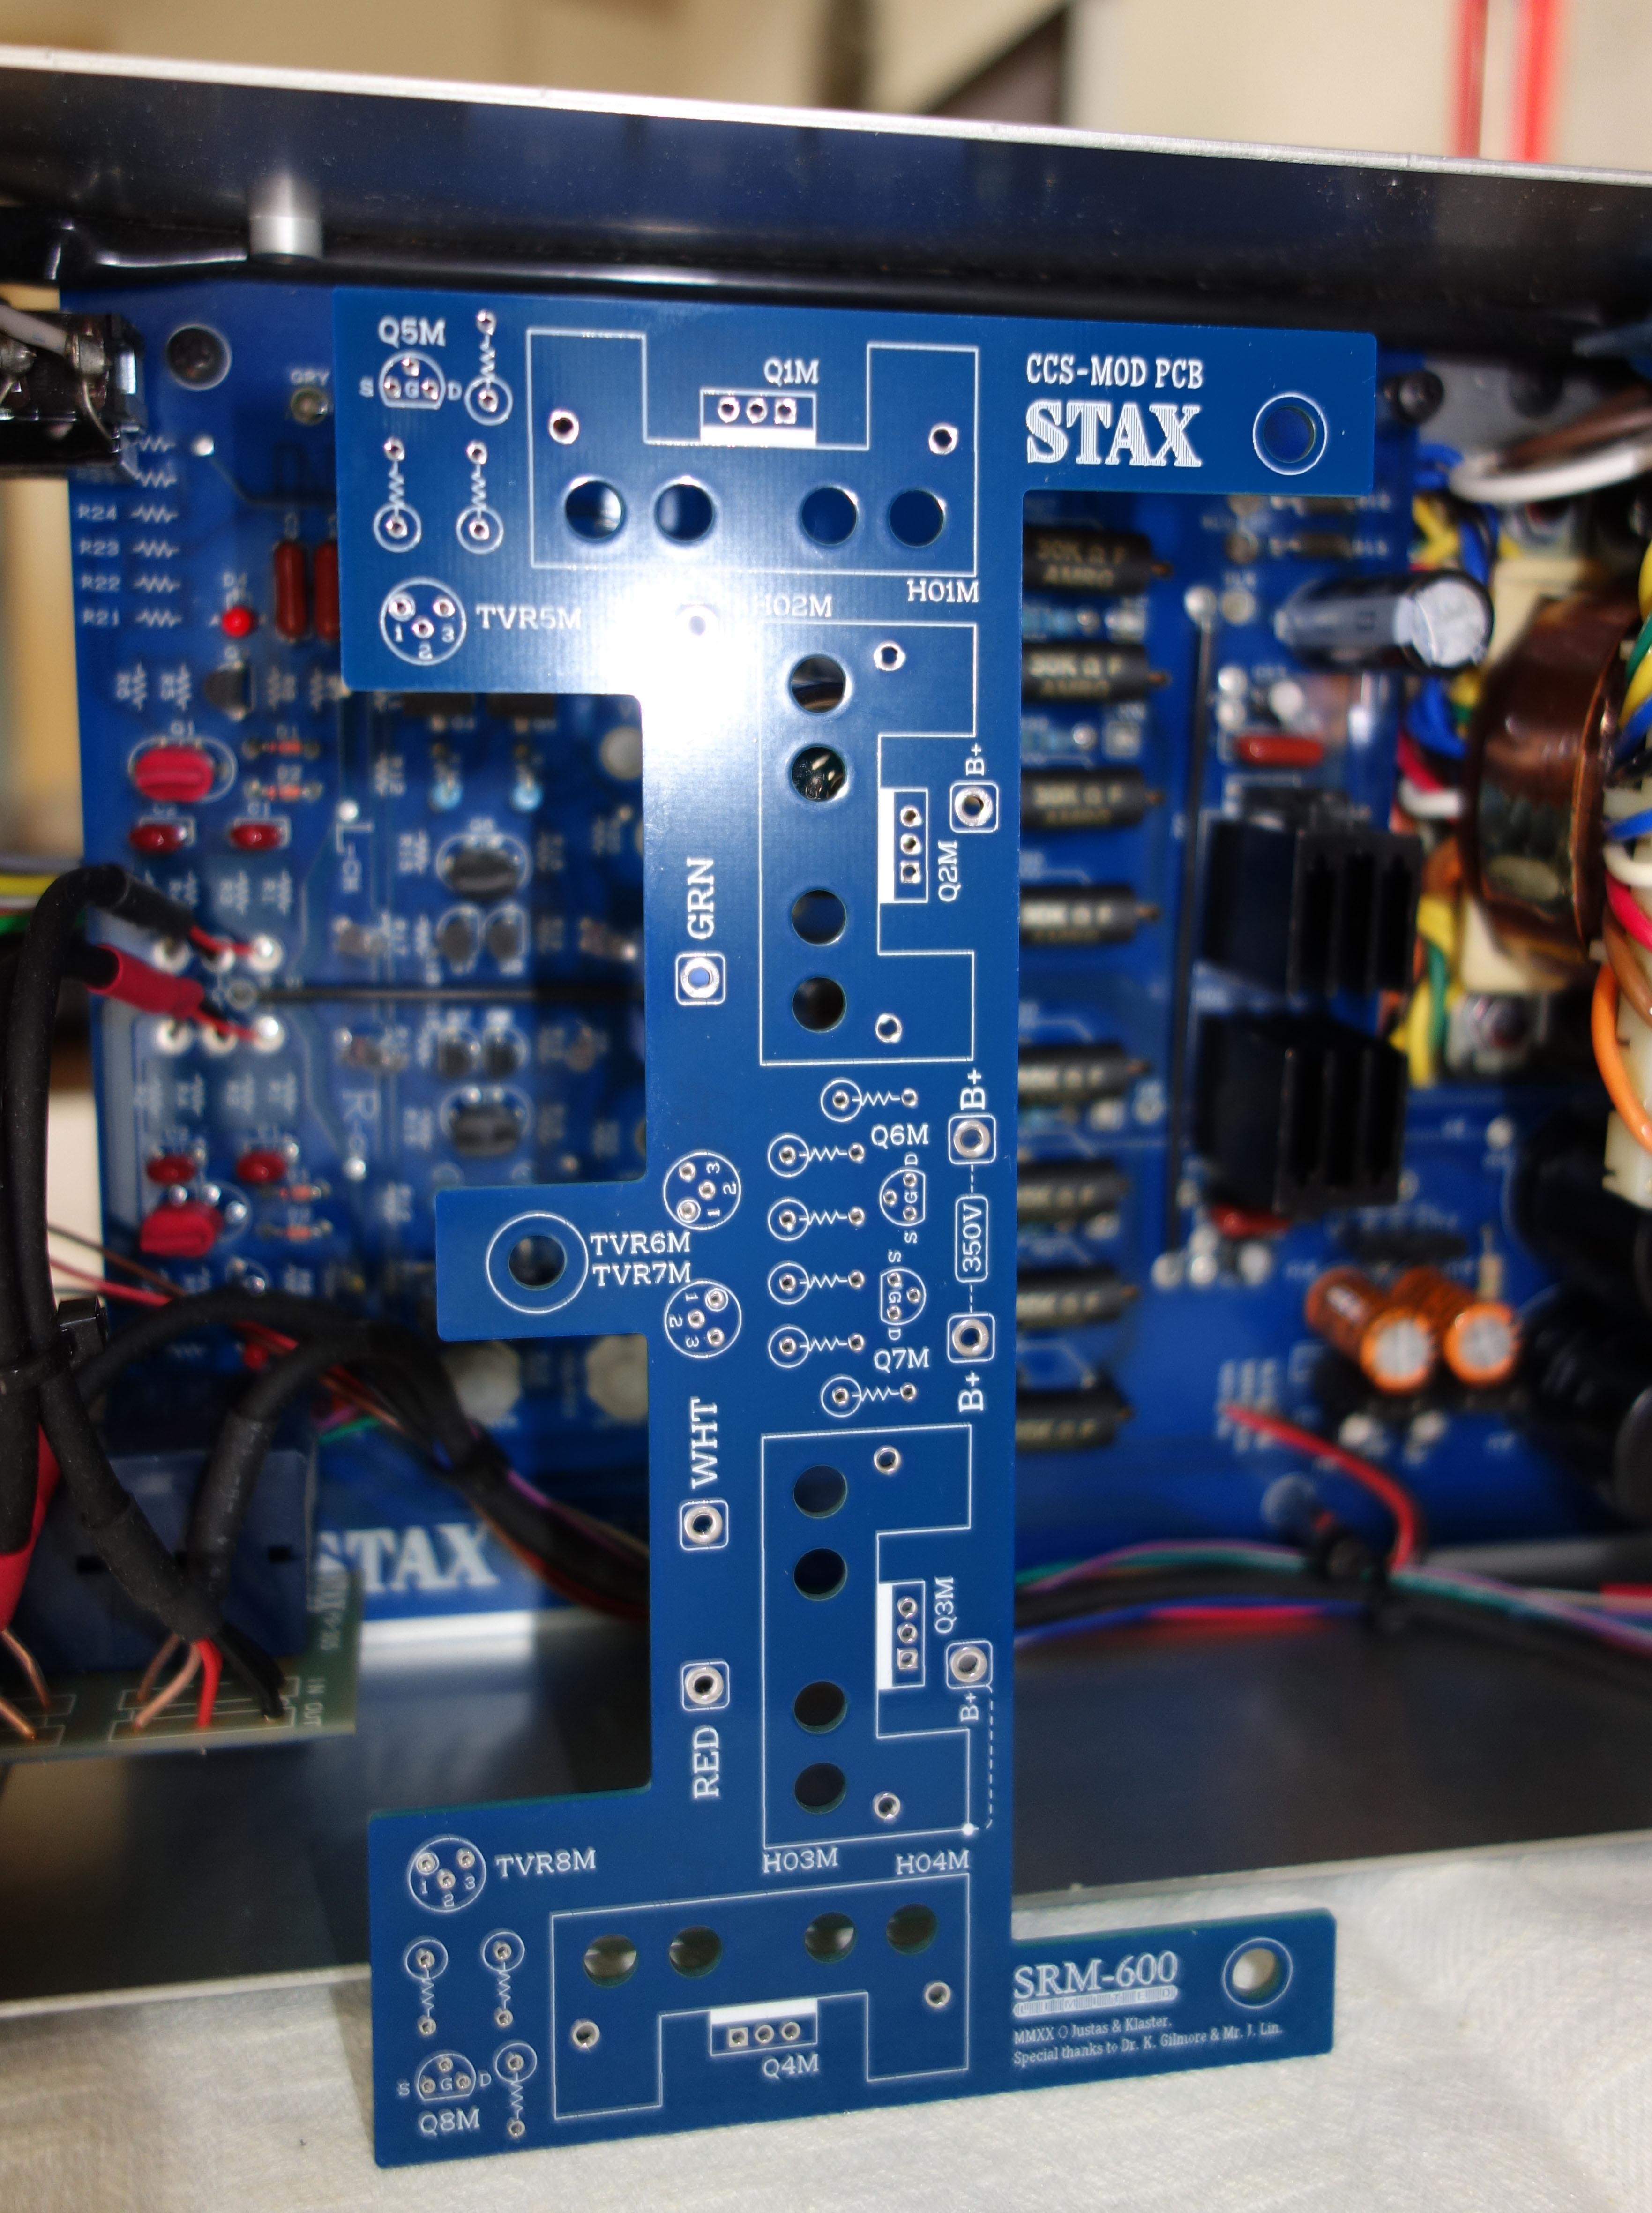 DSC03645-2.JPG